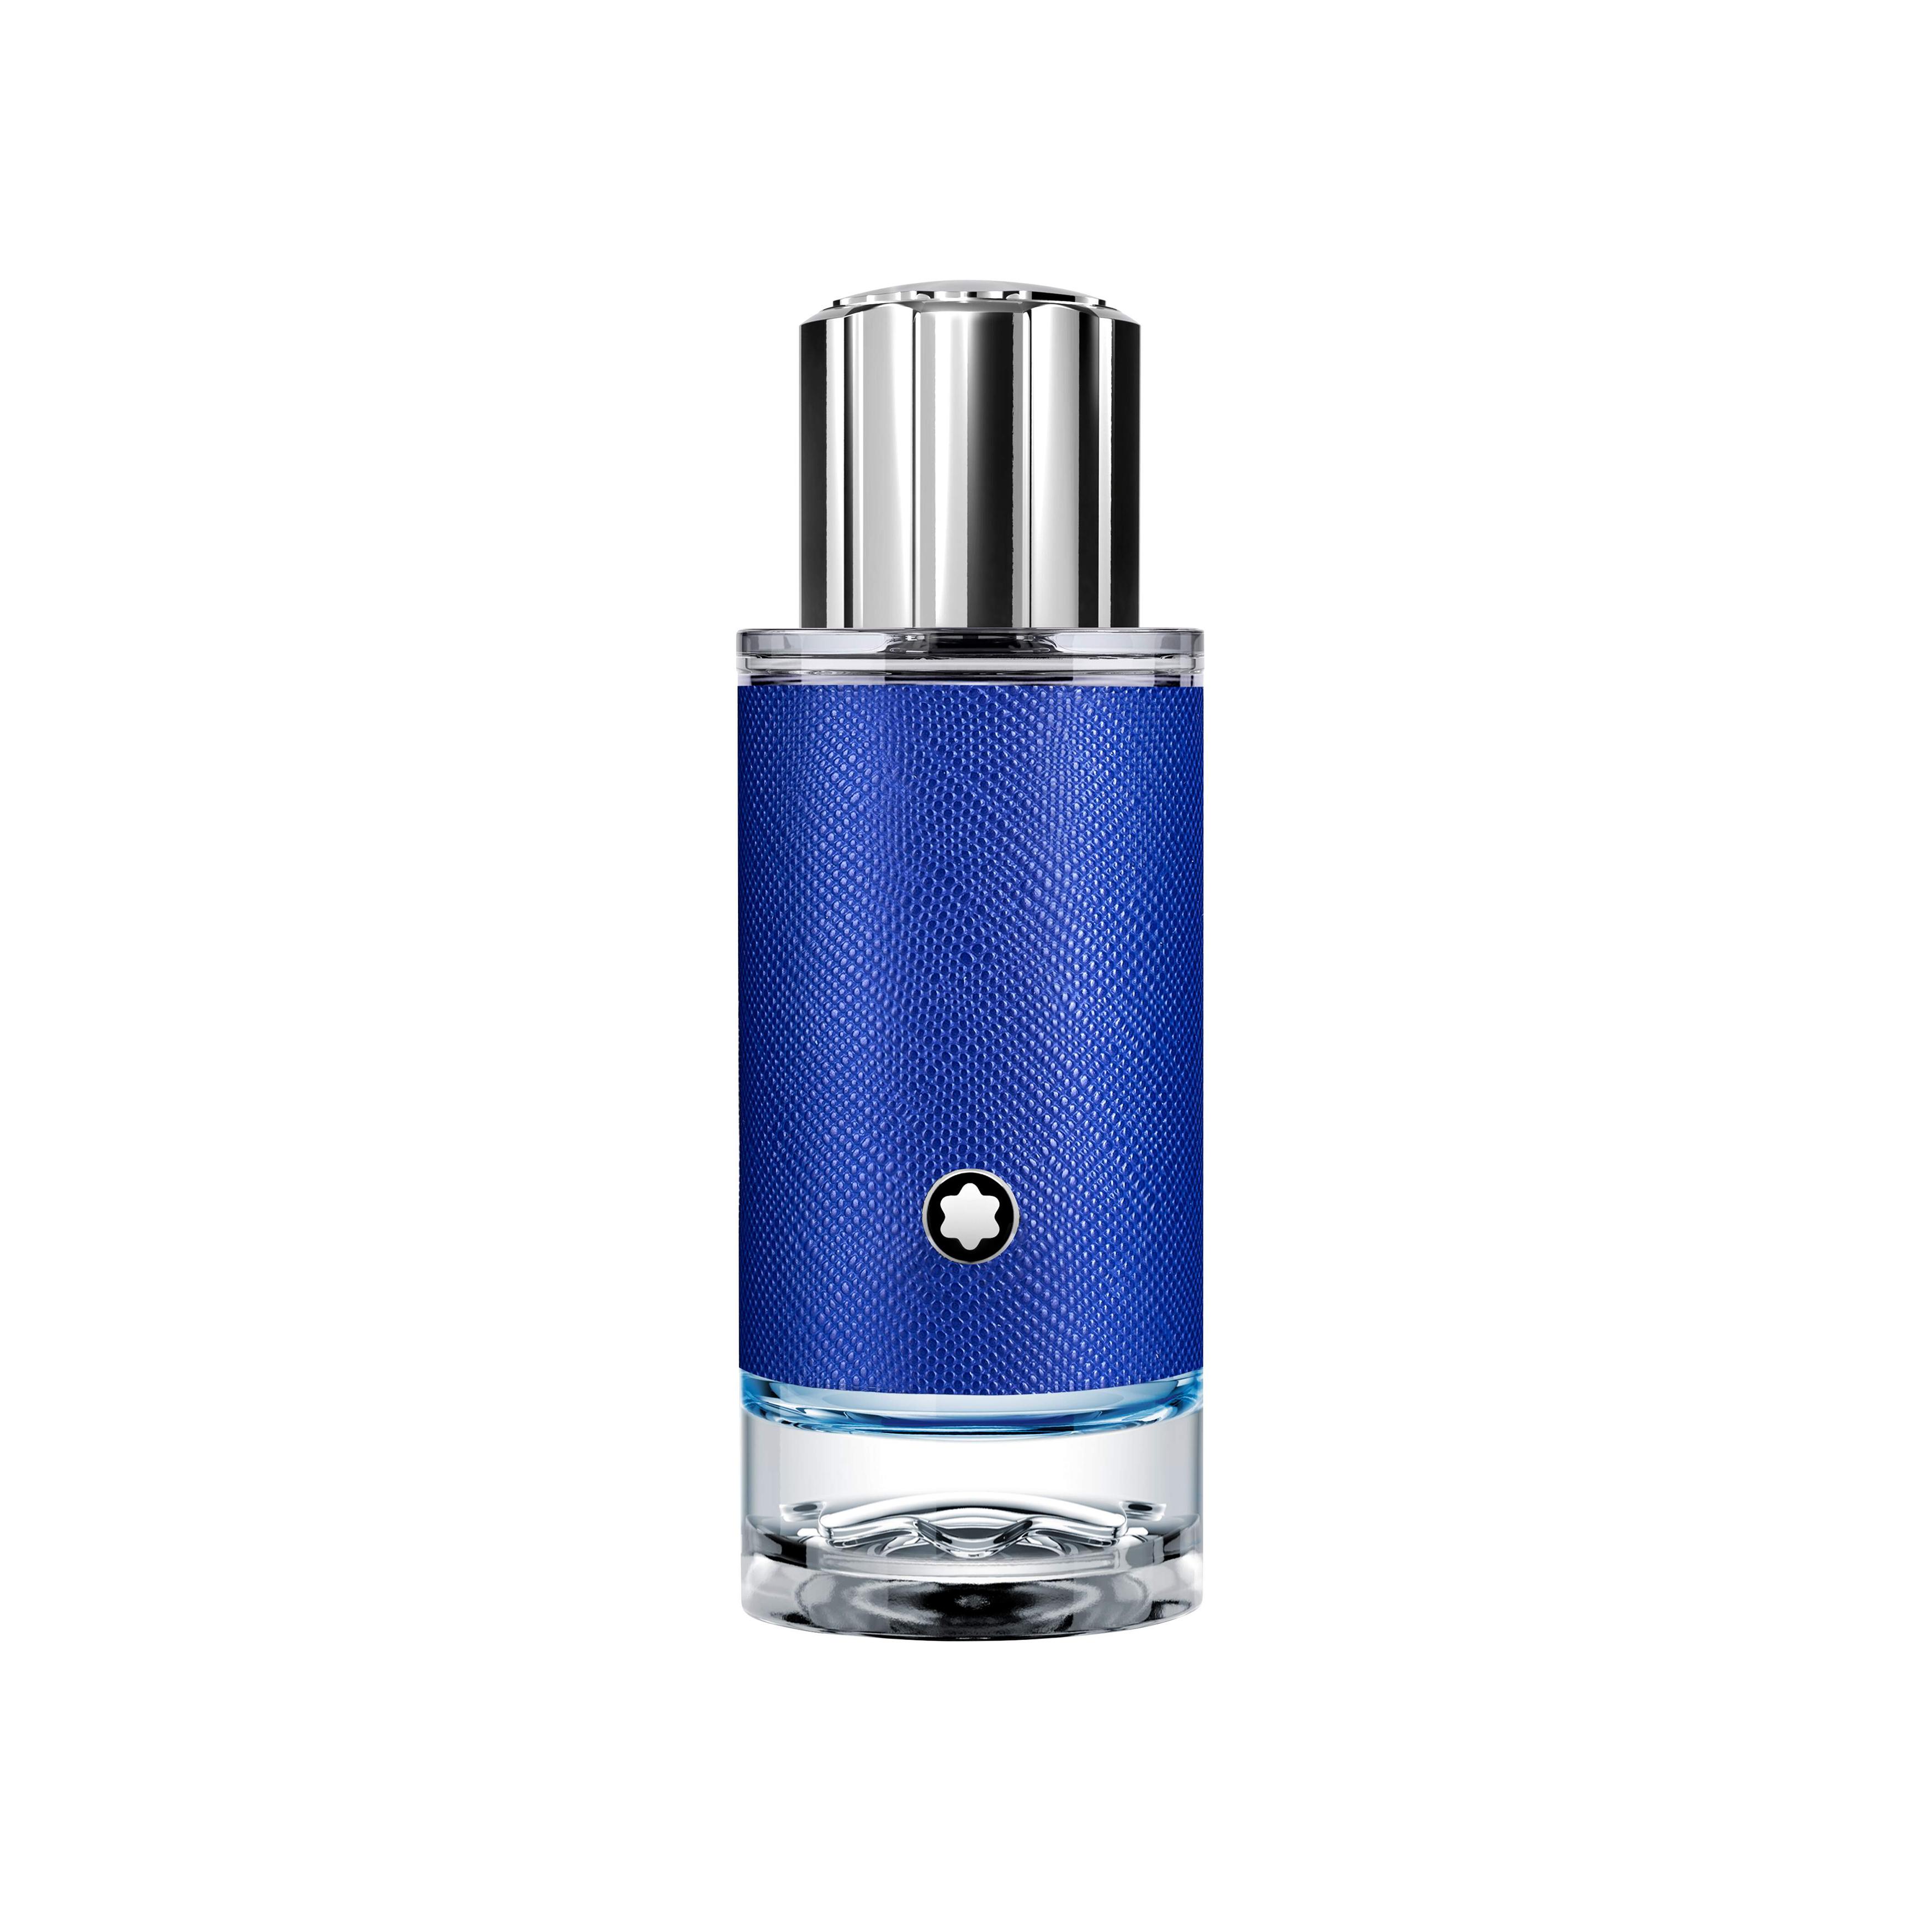 Mont Blanc Explorer Ultra Blue EDP, 30 ml